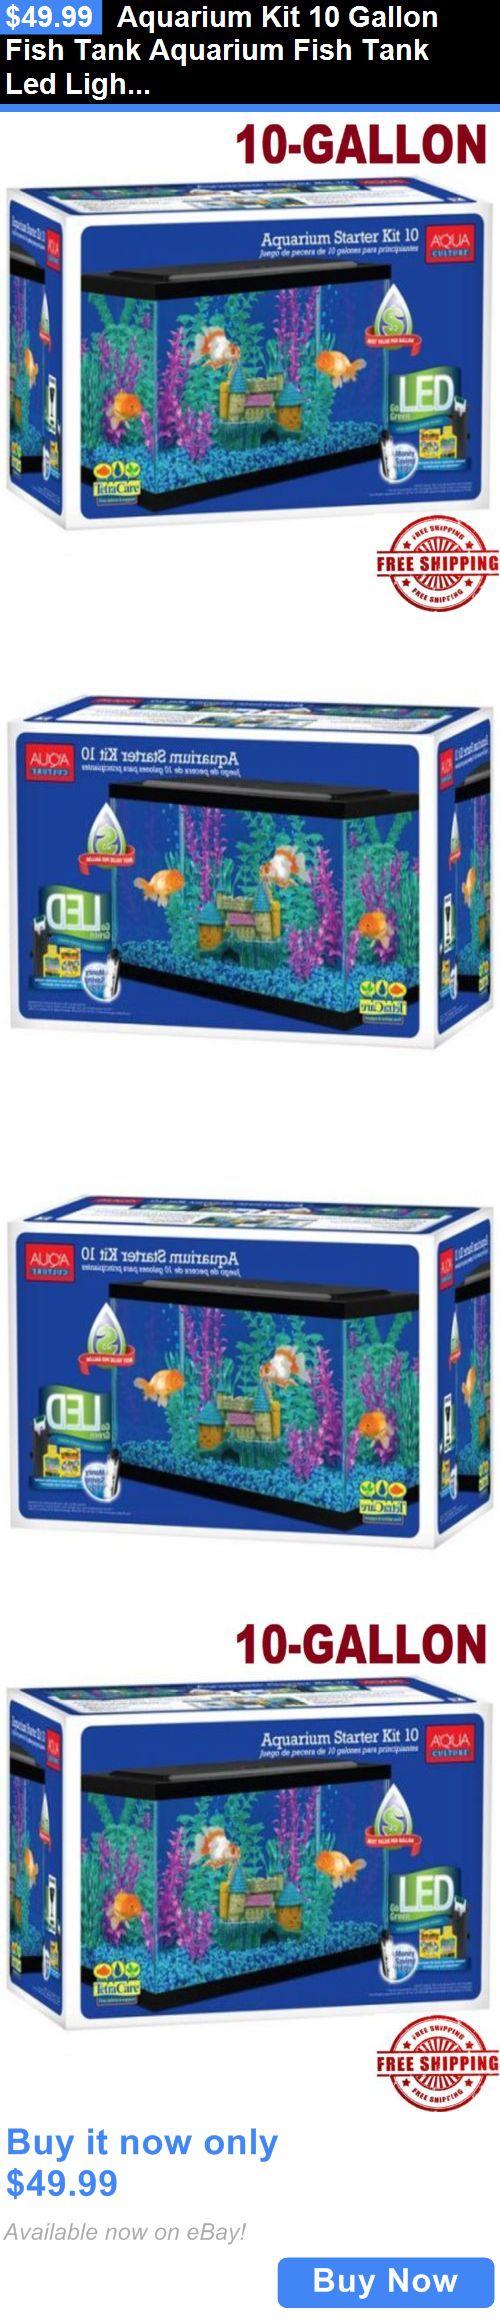 1000 ideas about 10 gallon fish tank on pinterest fish for Buy fish tank